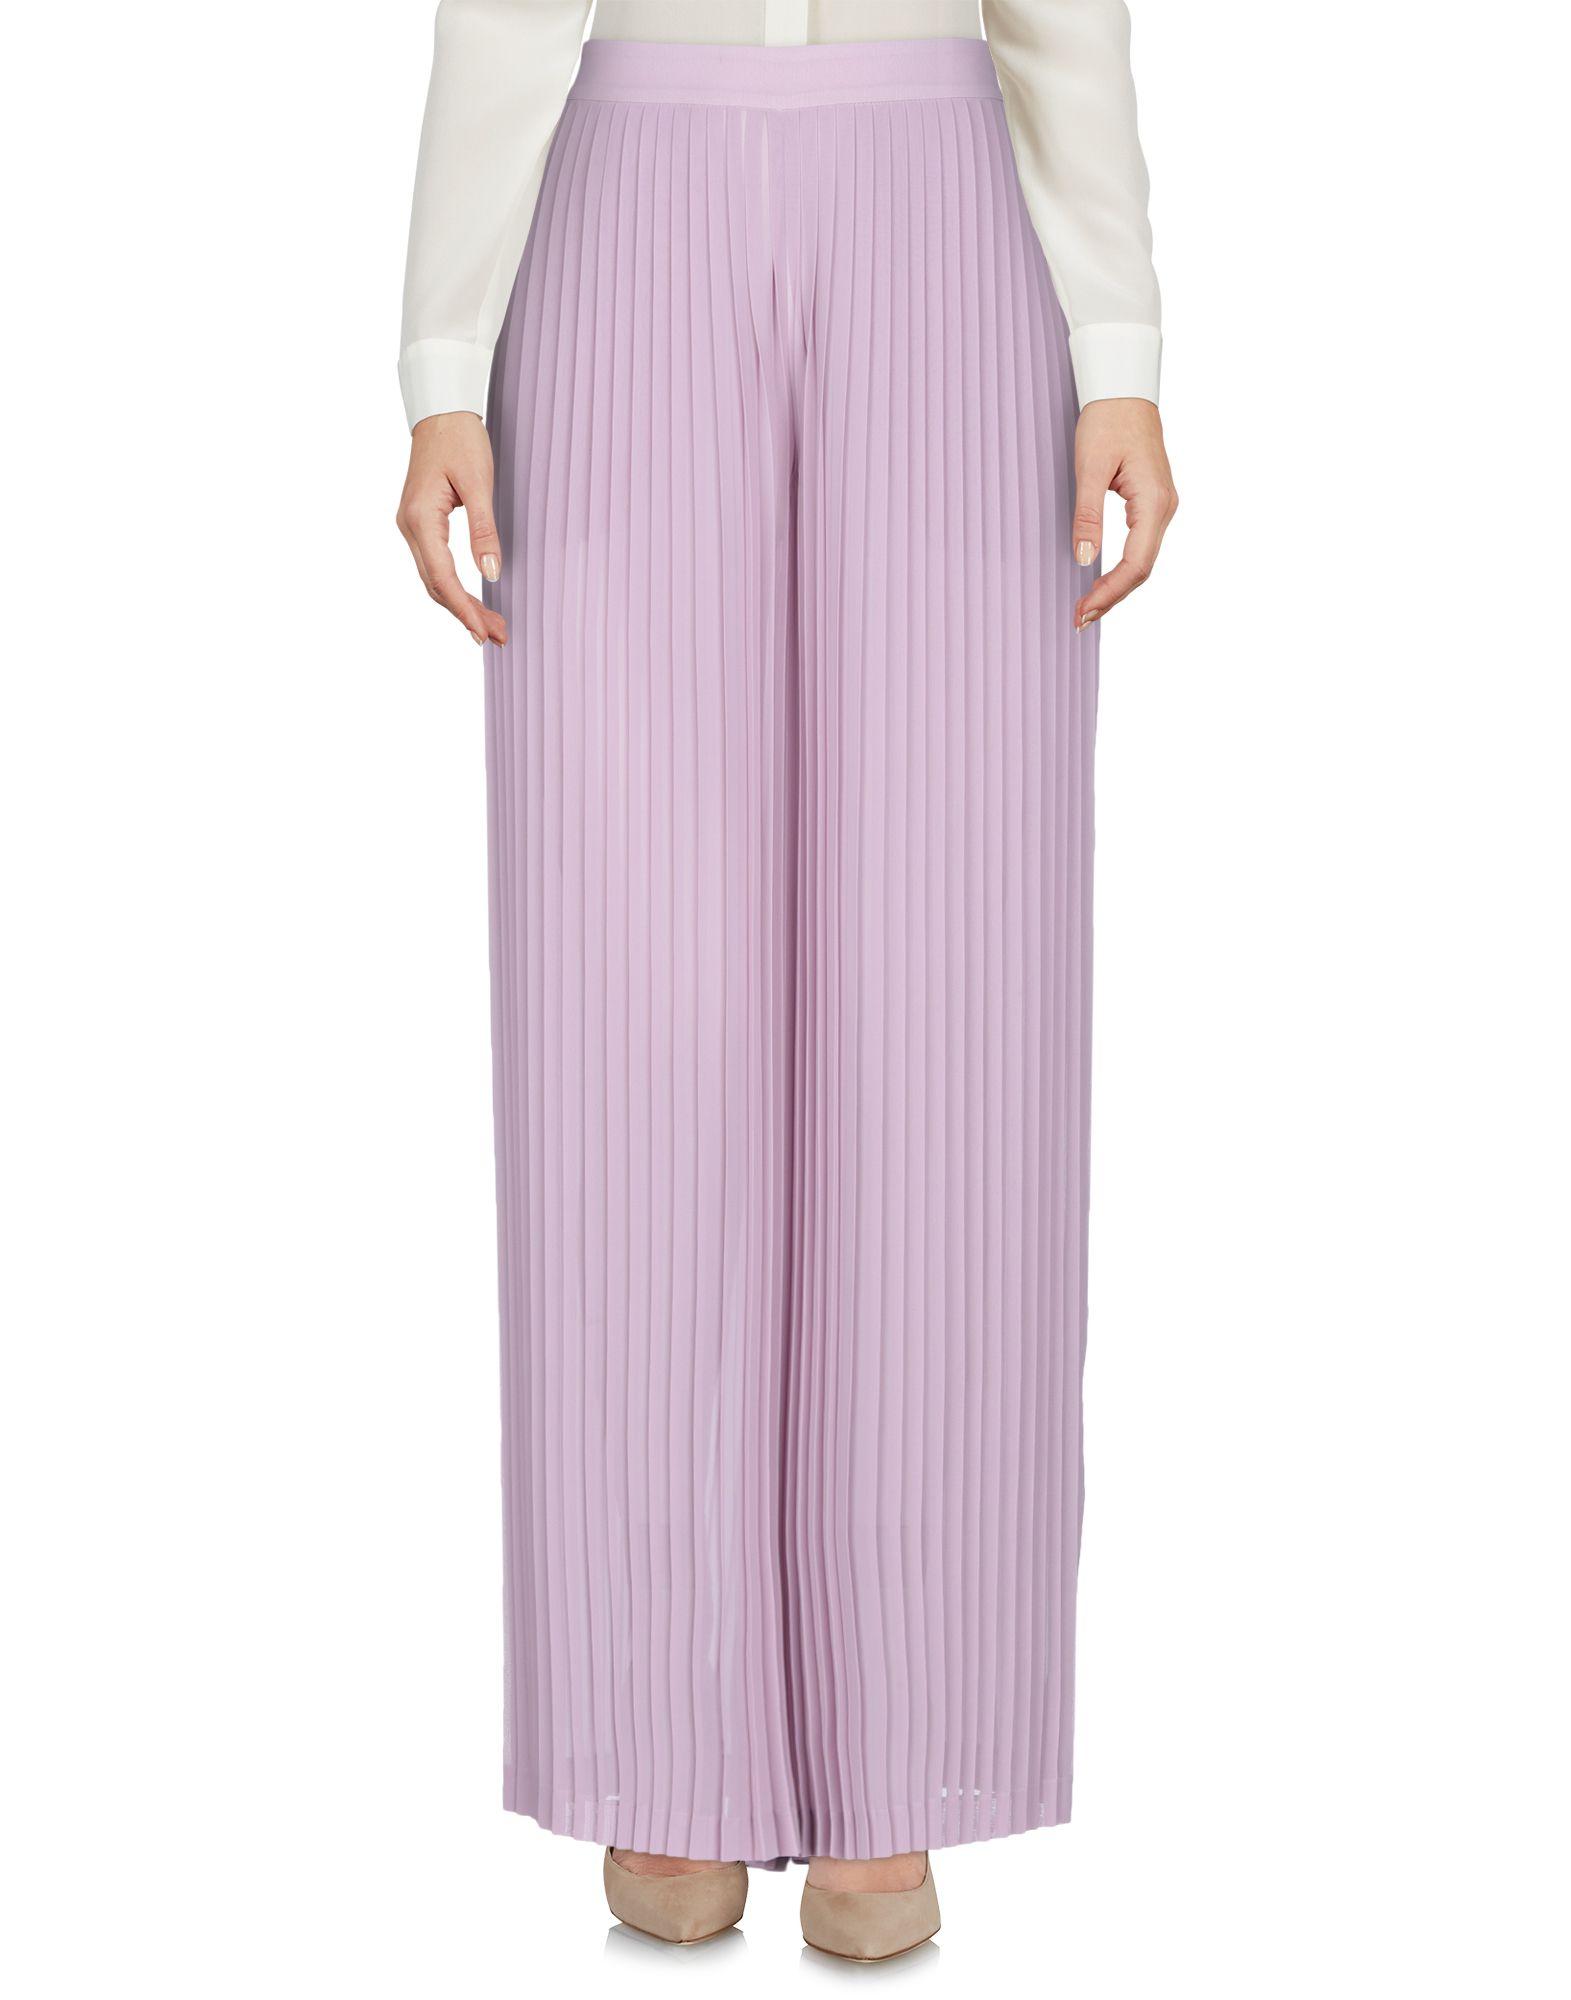 Pantalone blumarine donna - 13217908IC 13217908IC